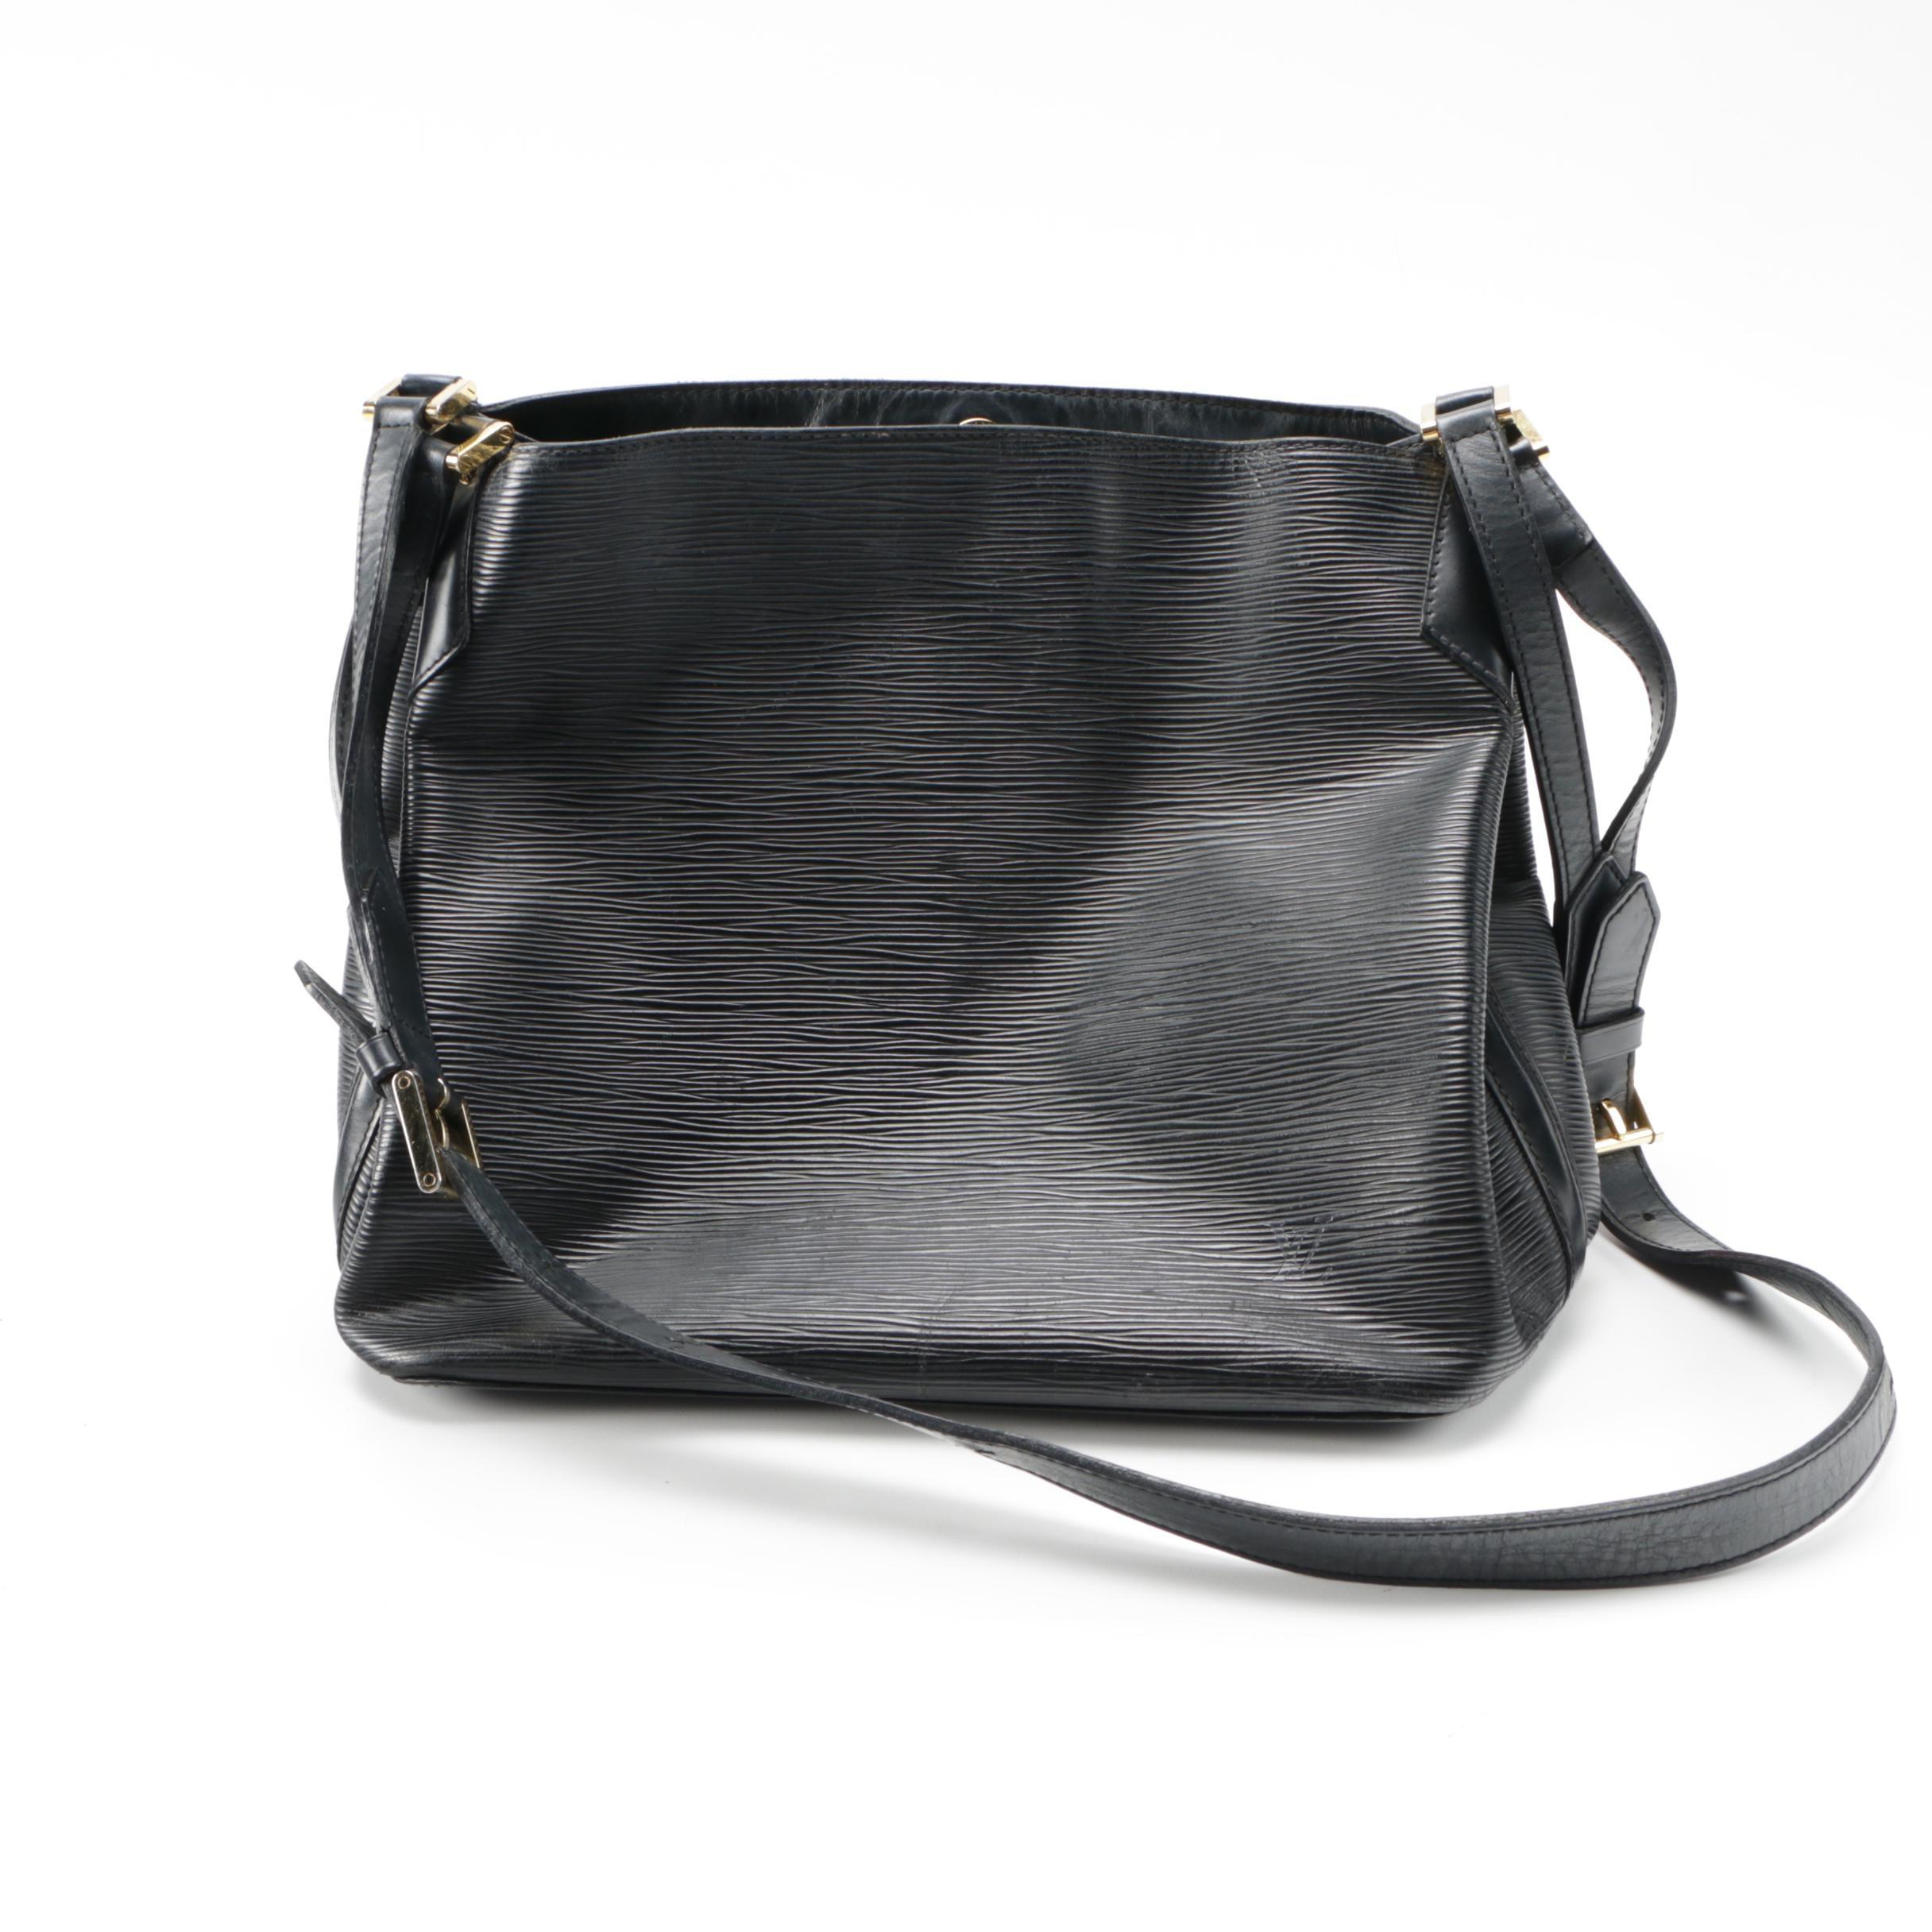 Louis Vuitton Mandara Black Epi Leather Handbag